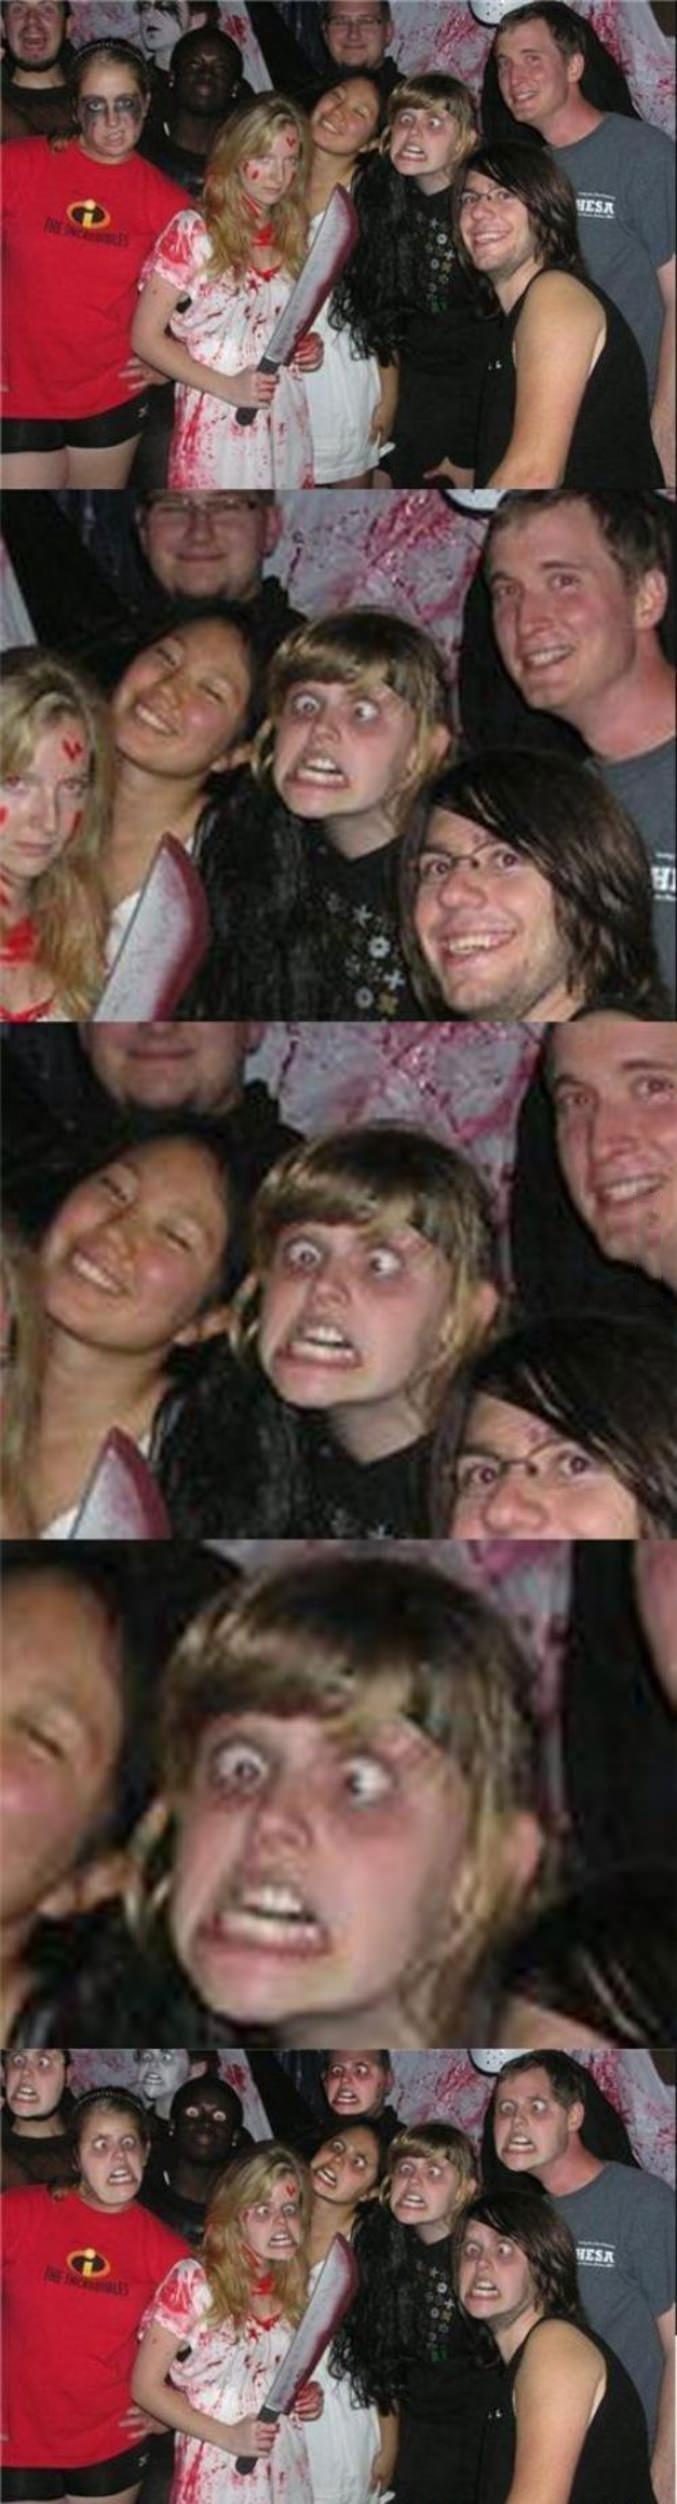 halloween party photobomb, face swap